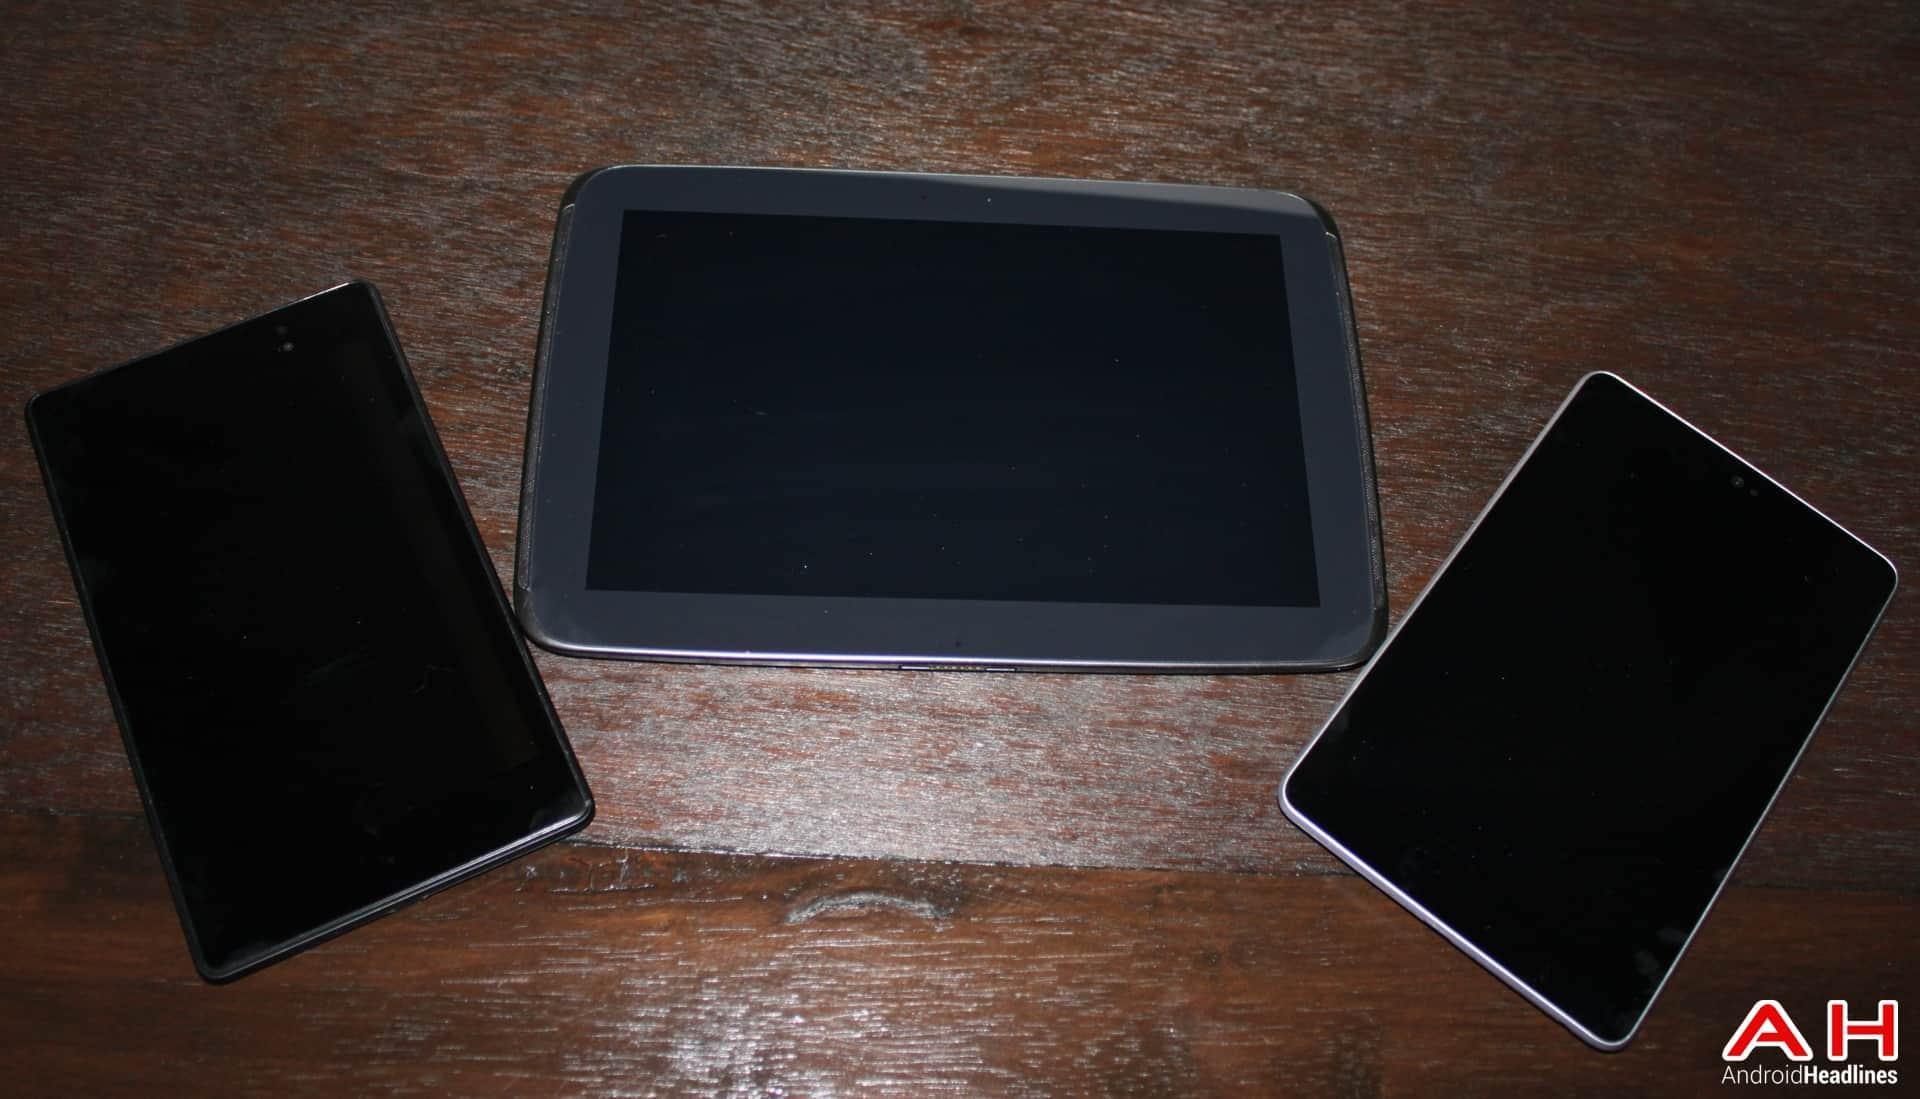 AH Samsung Galaxy Note 3 12.2 Tablet Nexus 10 7 tablets 1.1